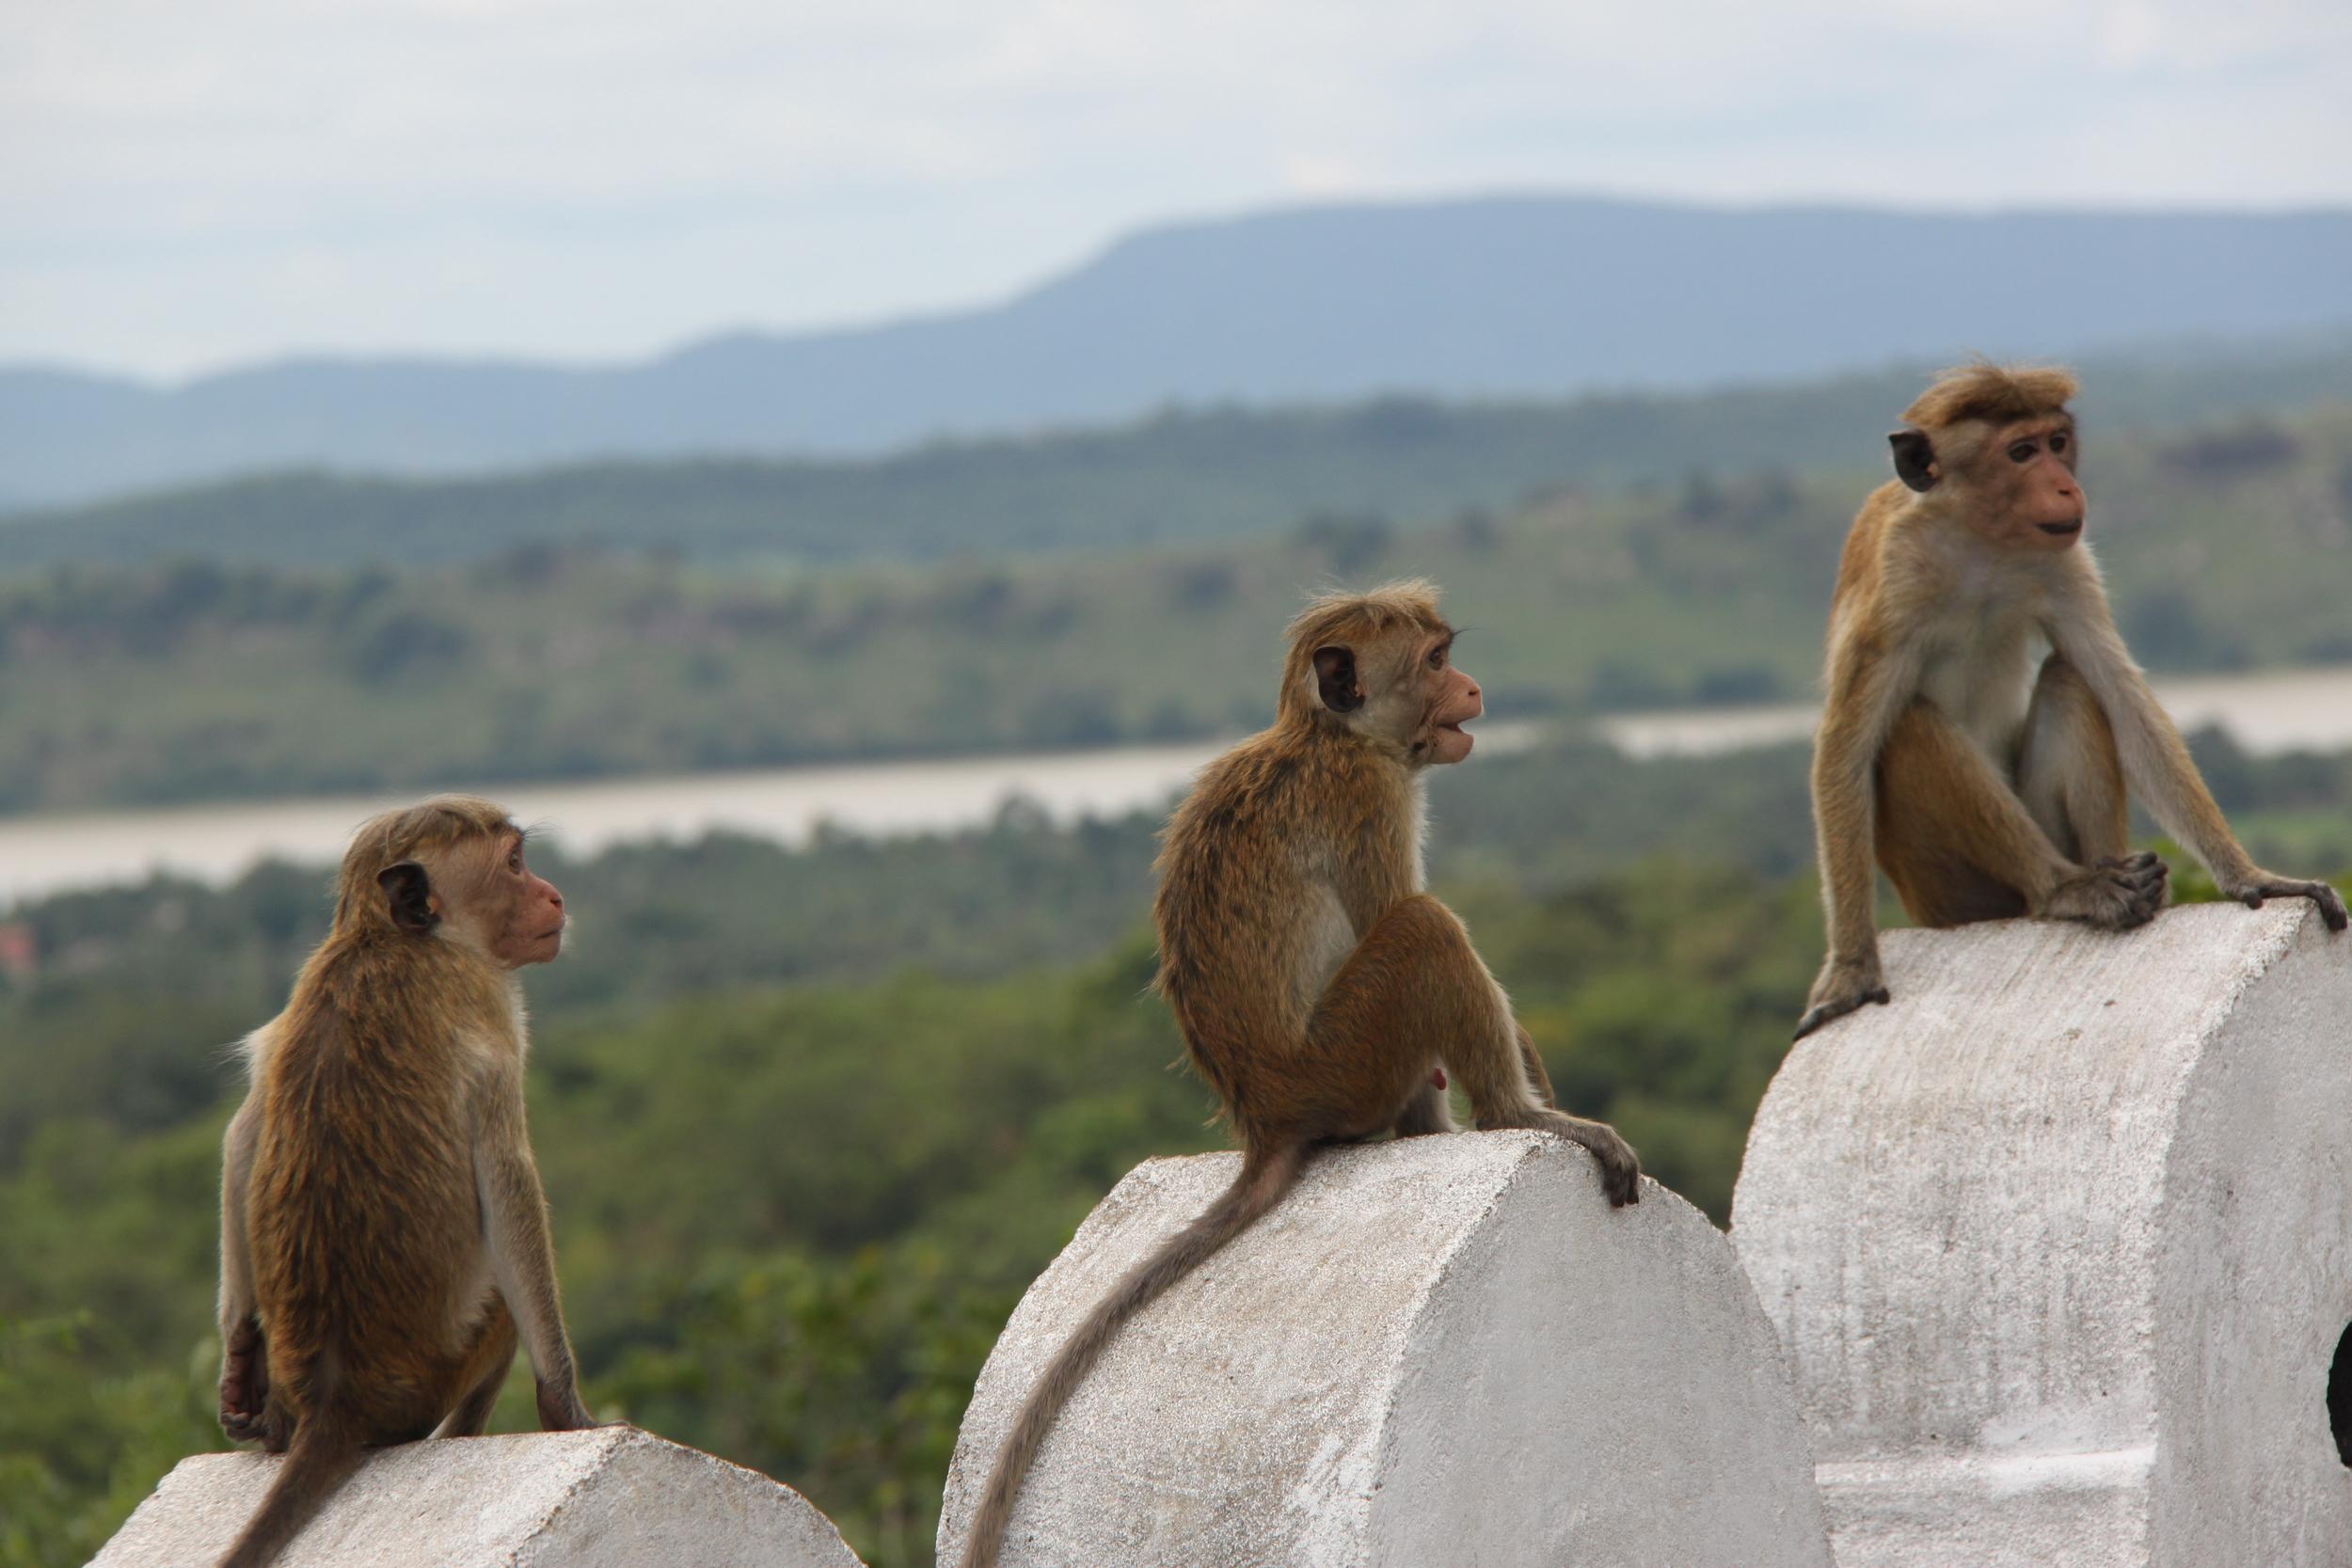 invite-to-paradise-sri-lanka-holiday-honeymoon-cultural-triangle-dambulla-cave-temple-view-monkeys-2.jpg